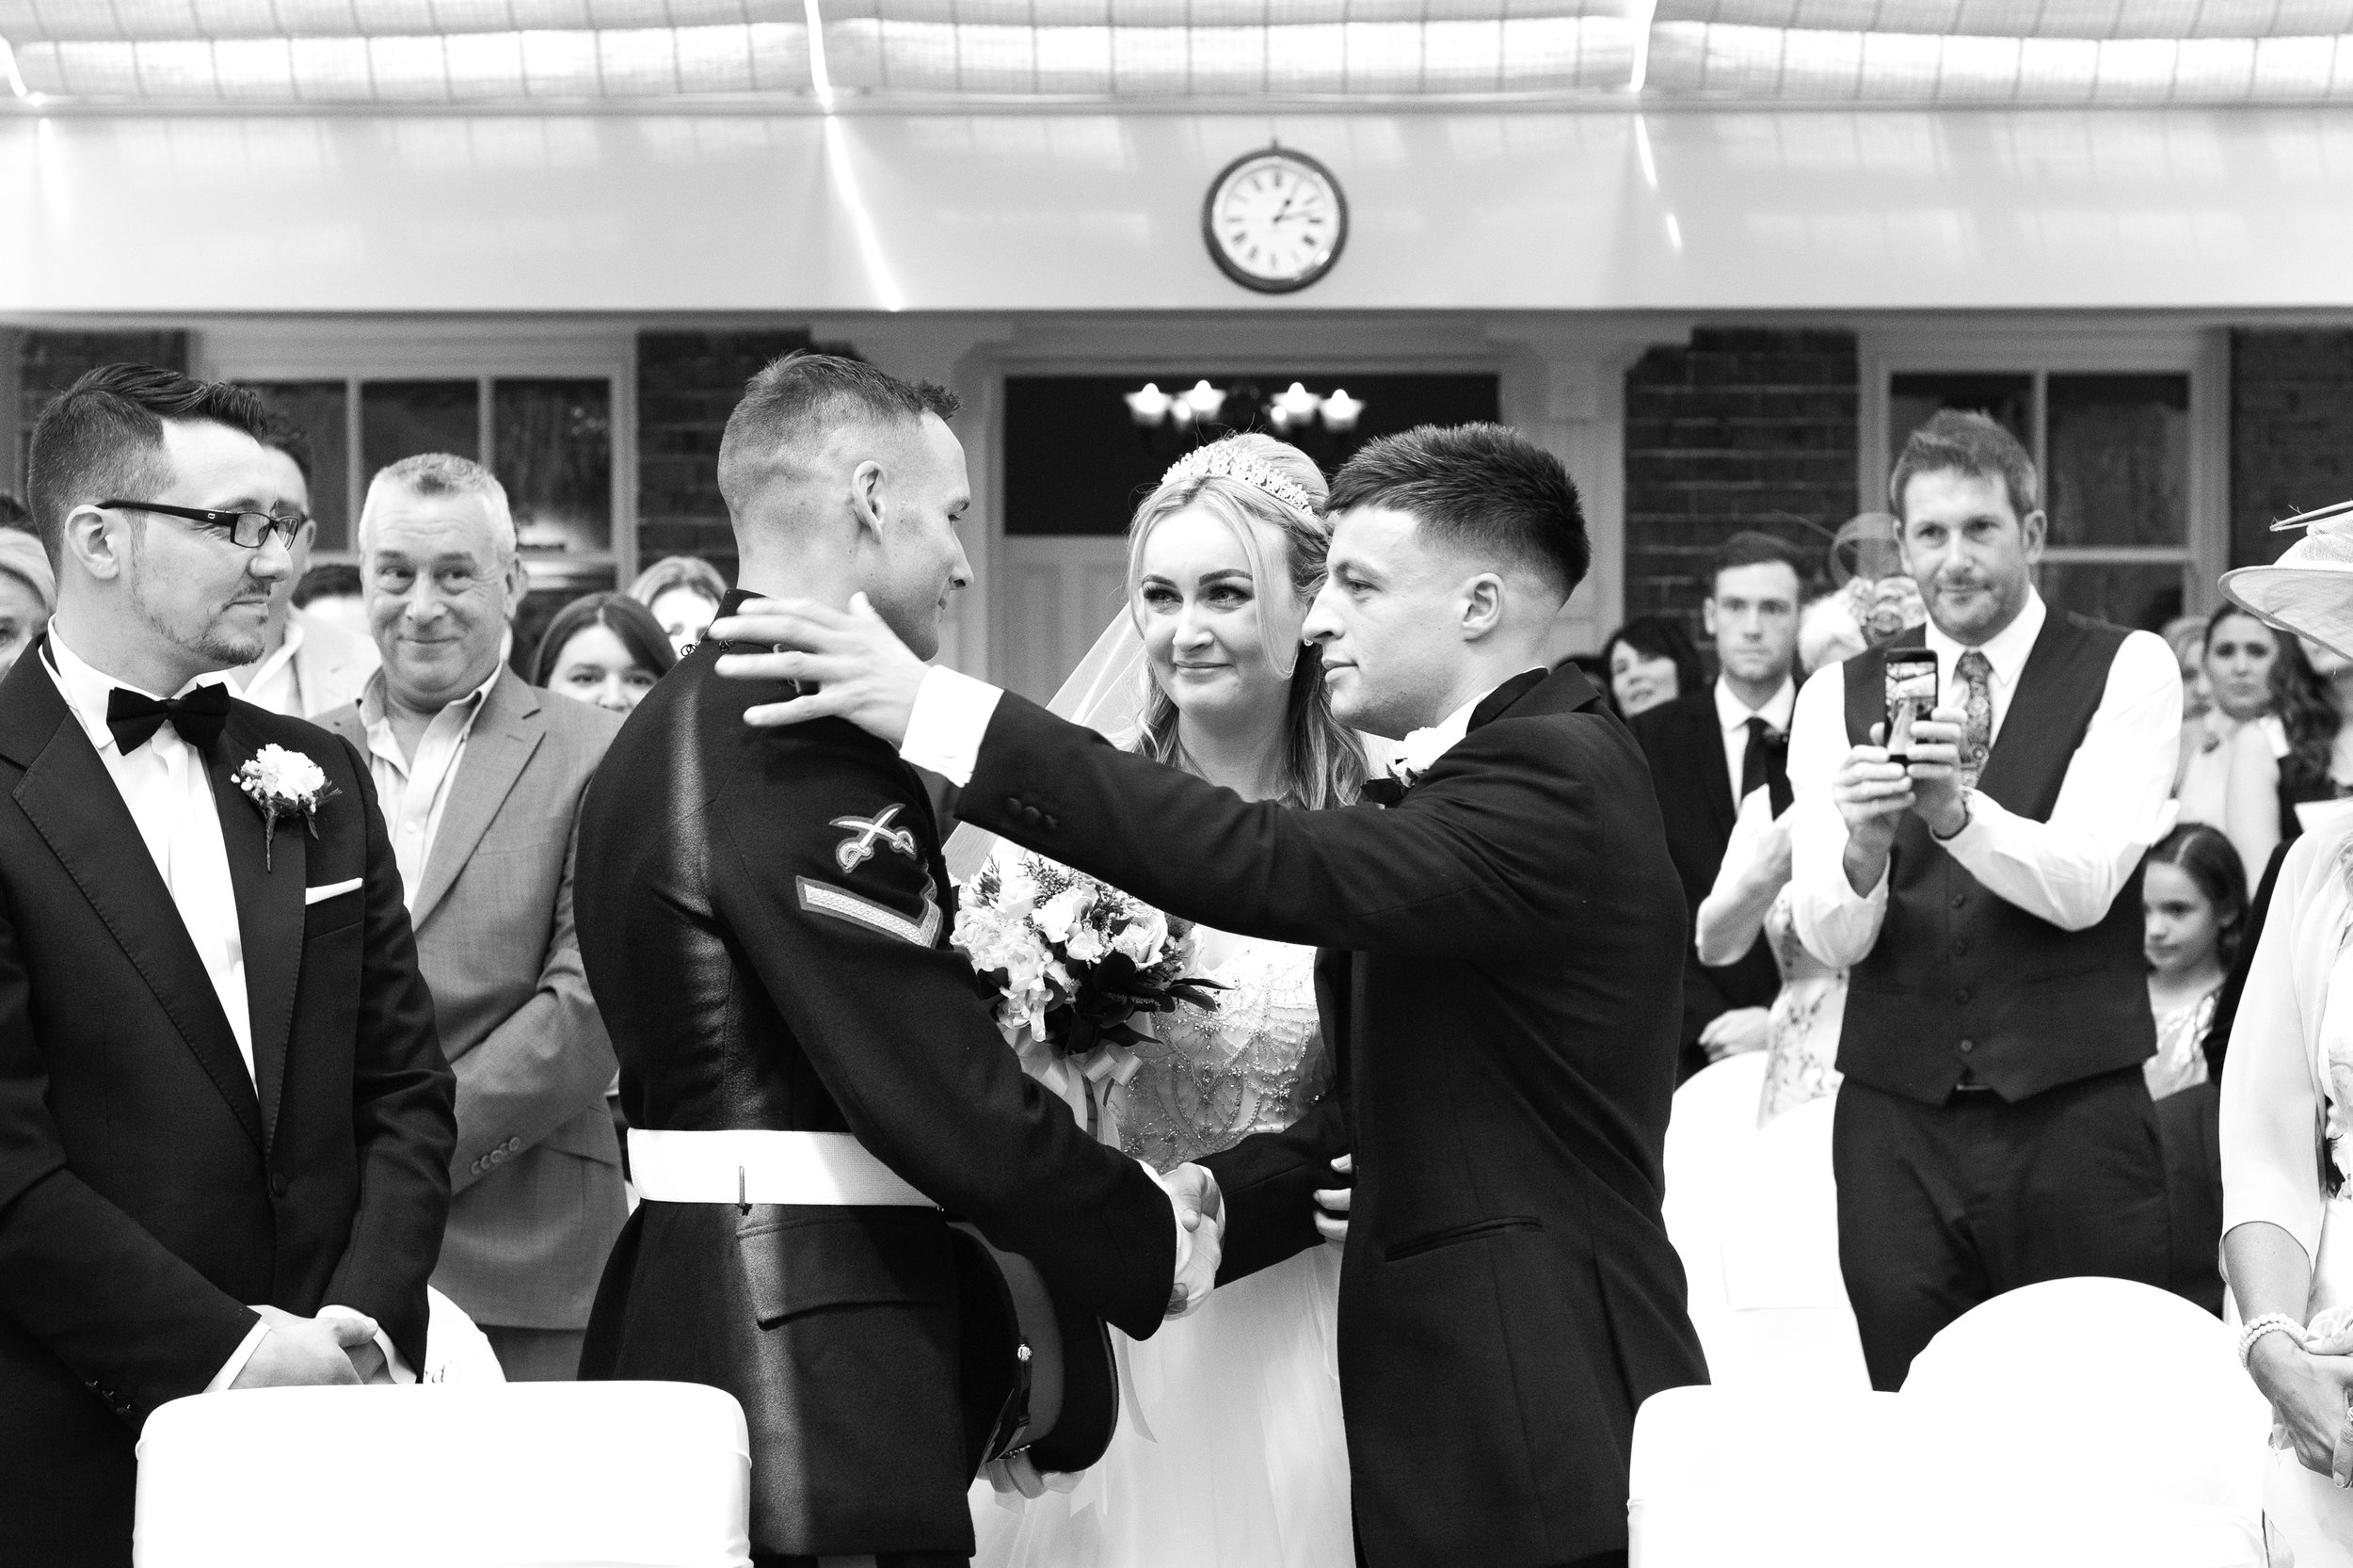 wedding-lea-cooper-photography-willenhall-west-midlands-wolverhampton-dudley-birmingham-uk-marriage-hadley-park-east-telford-hand-shake.jpg